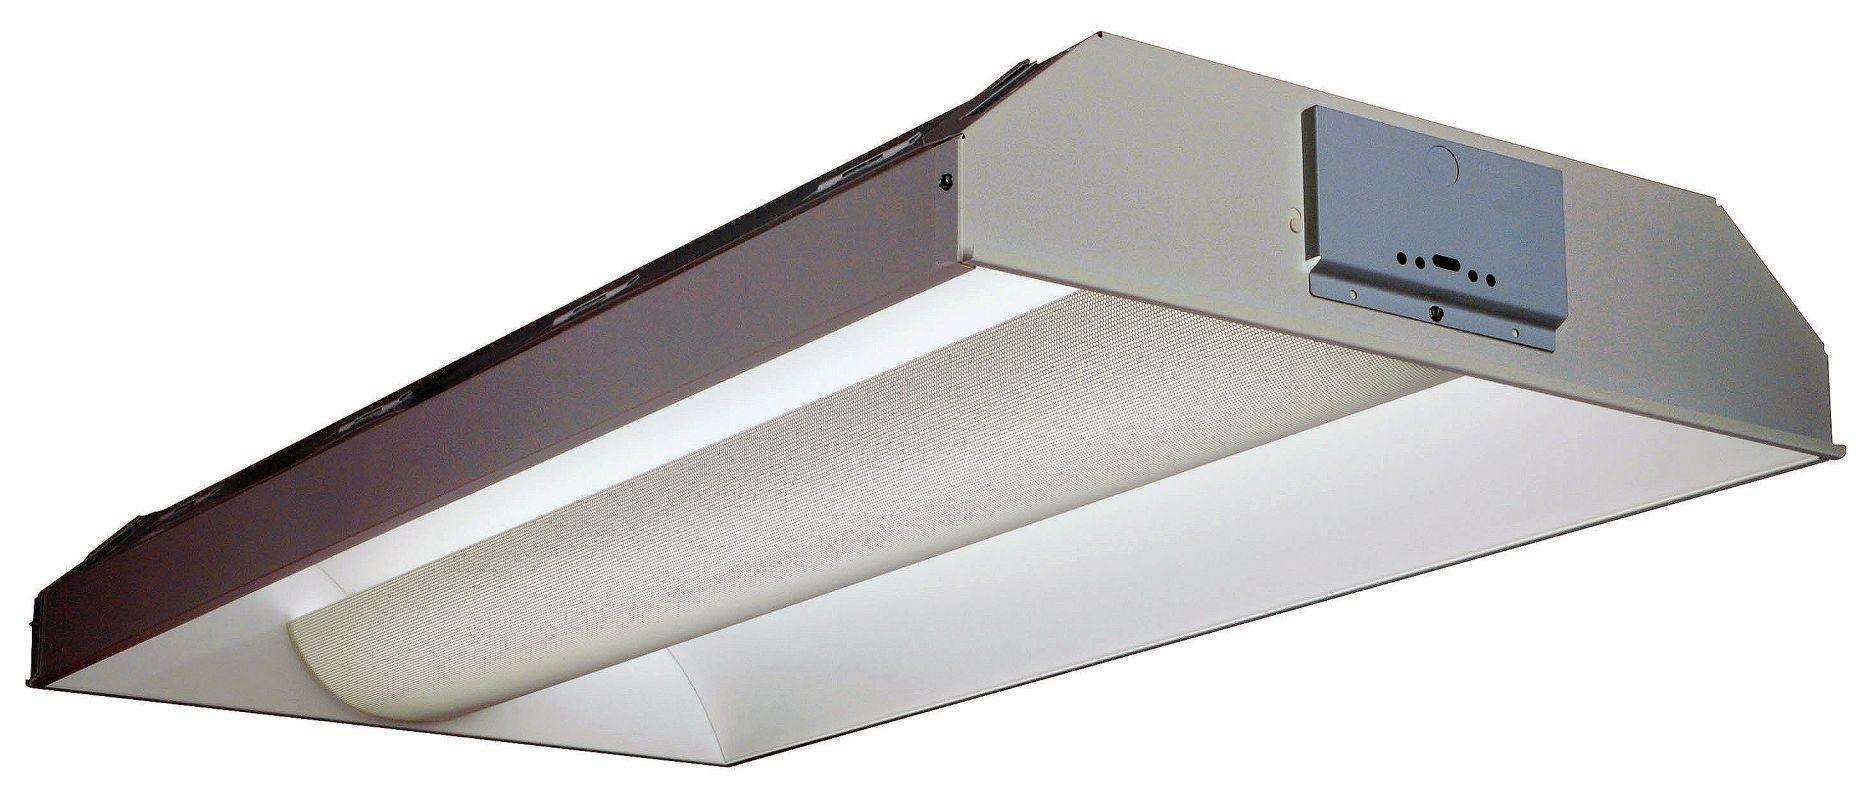 "Lithonia Lighting 2AV G 3 32 MDR MVOLT 1/3 GEB10IS 3 Light 48"""